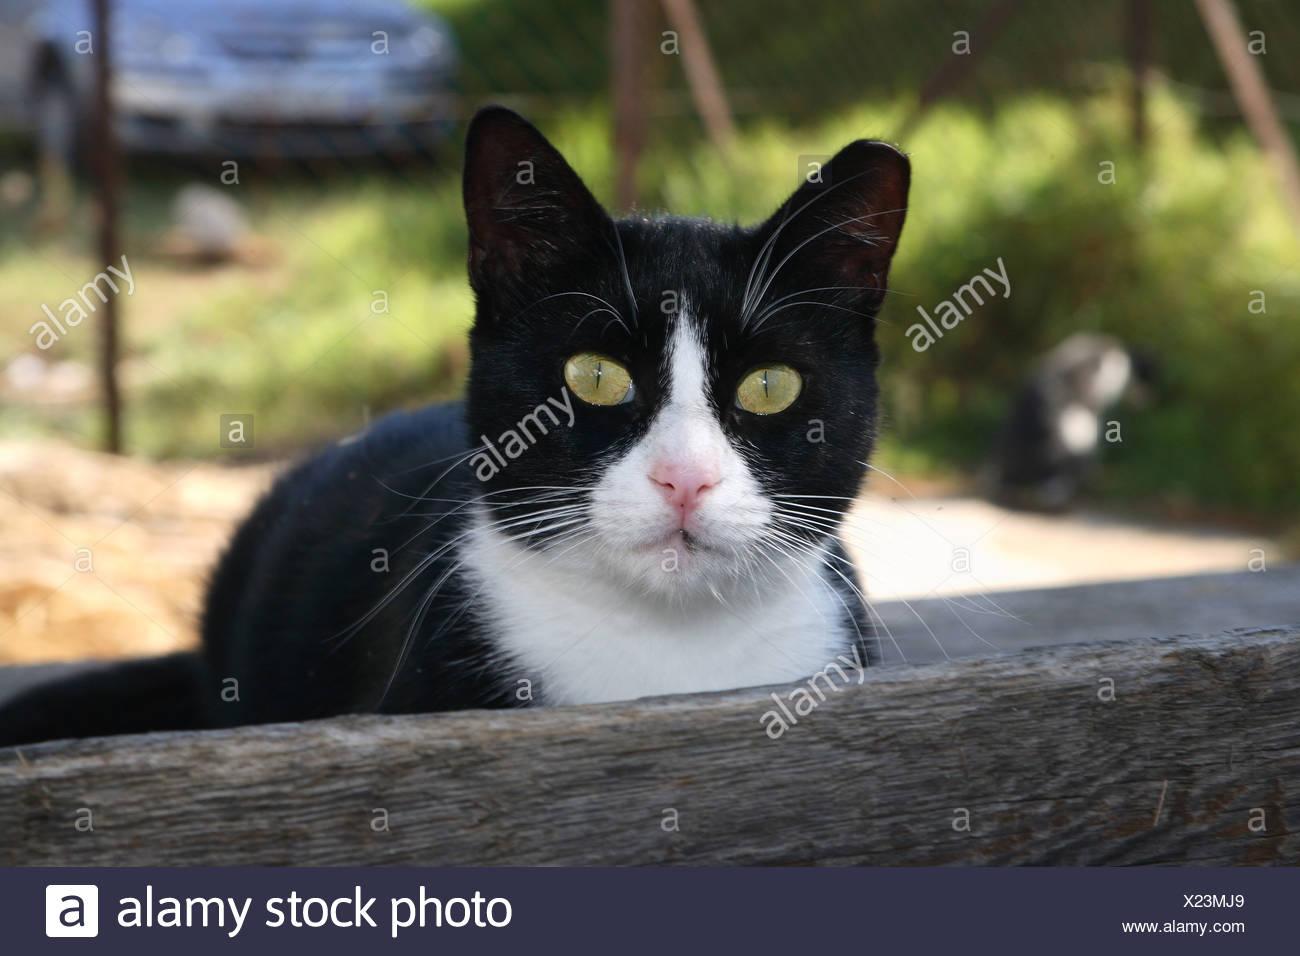 Katze Schwarz-Weiß-Kamera Porträt außerhalb Tier Haustier Hauskatze ...